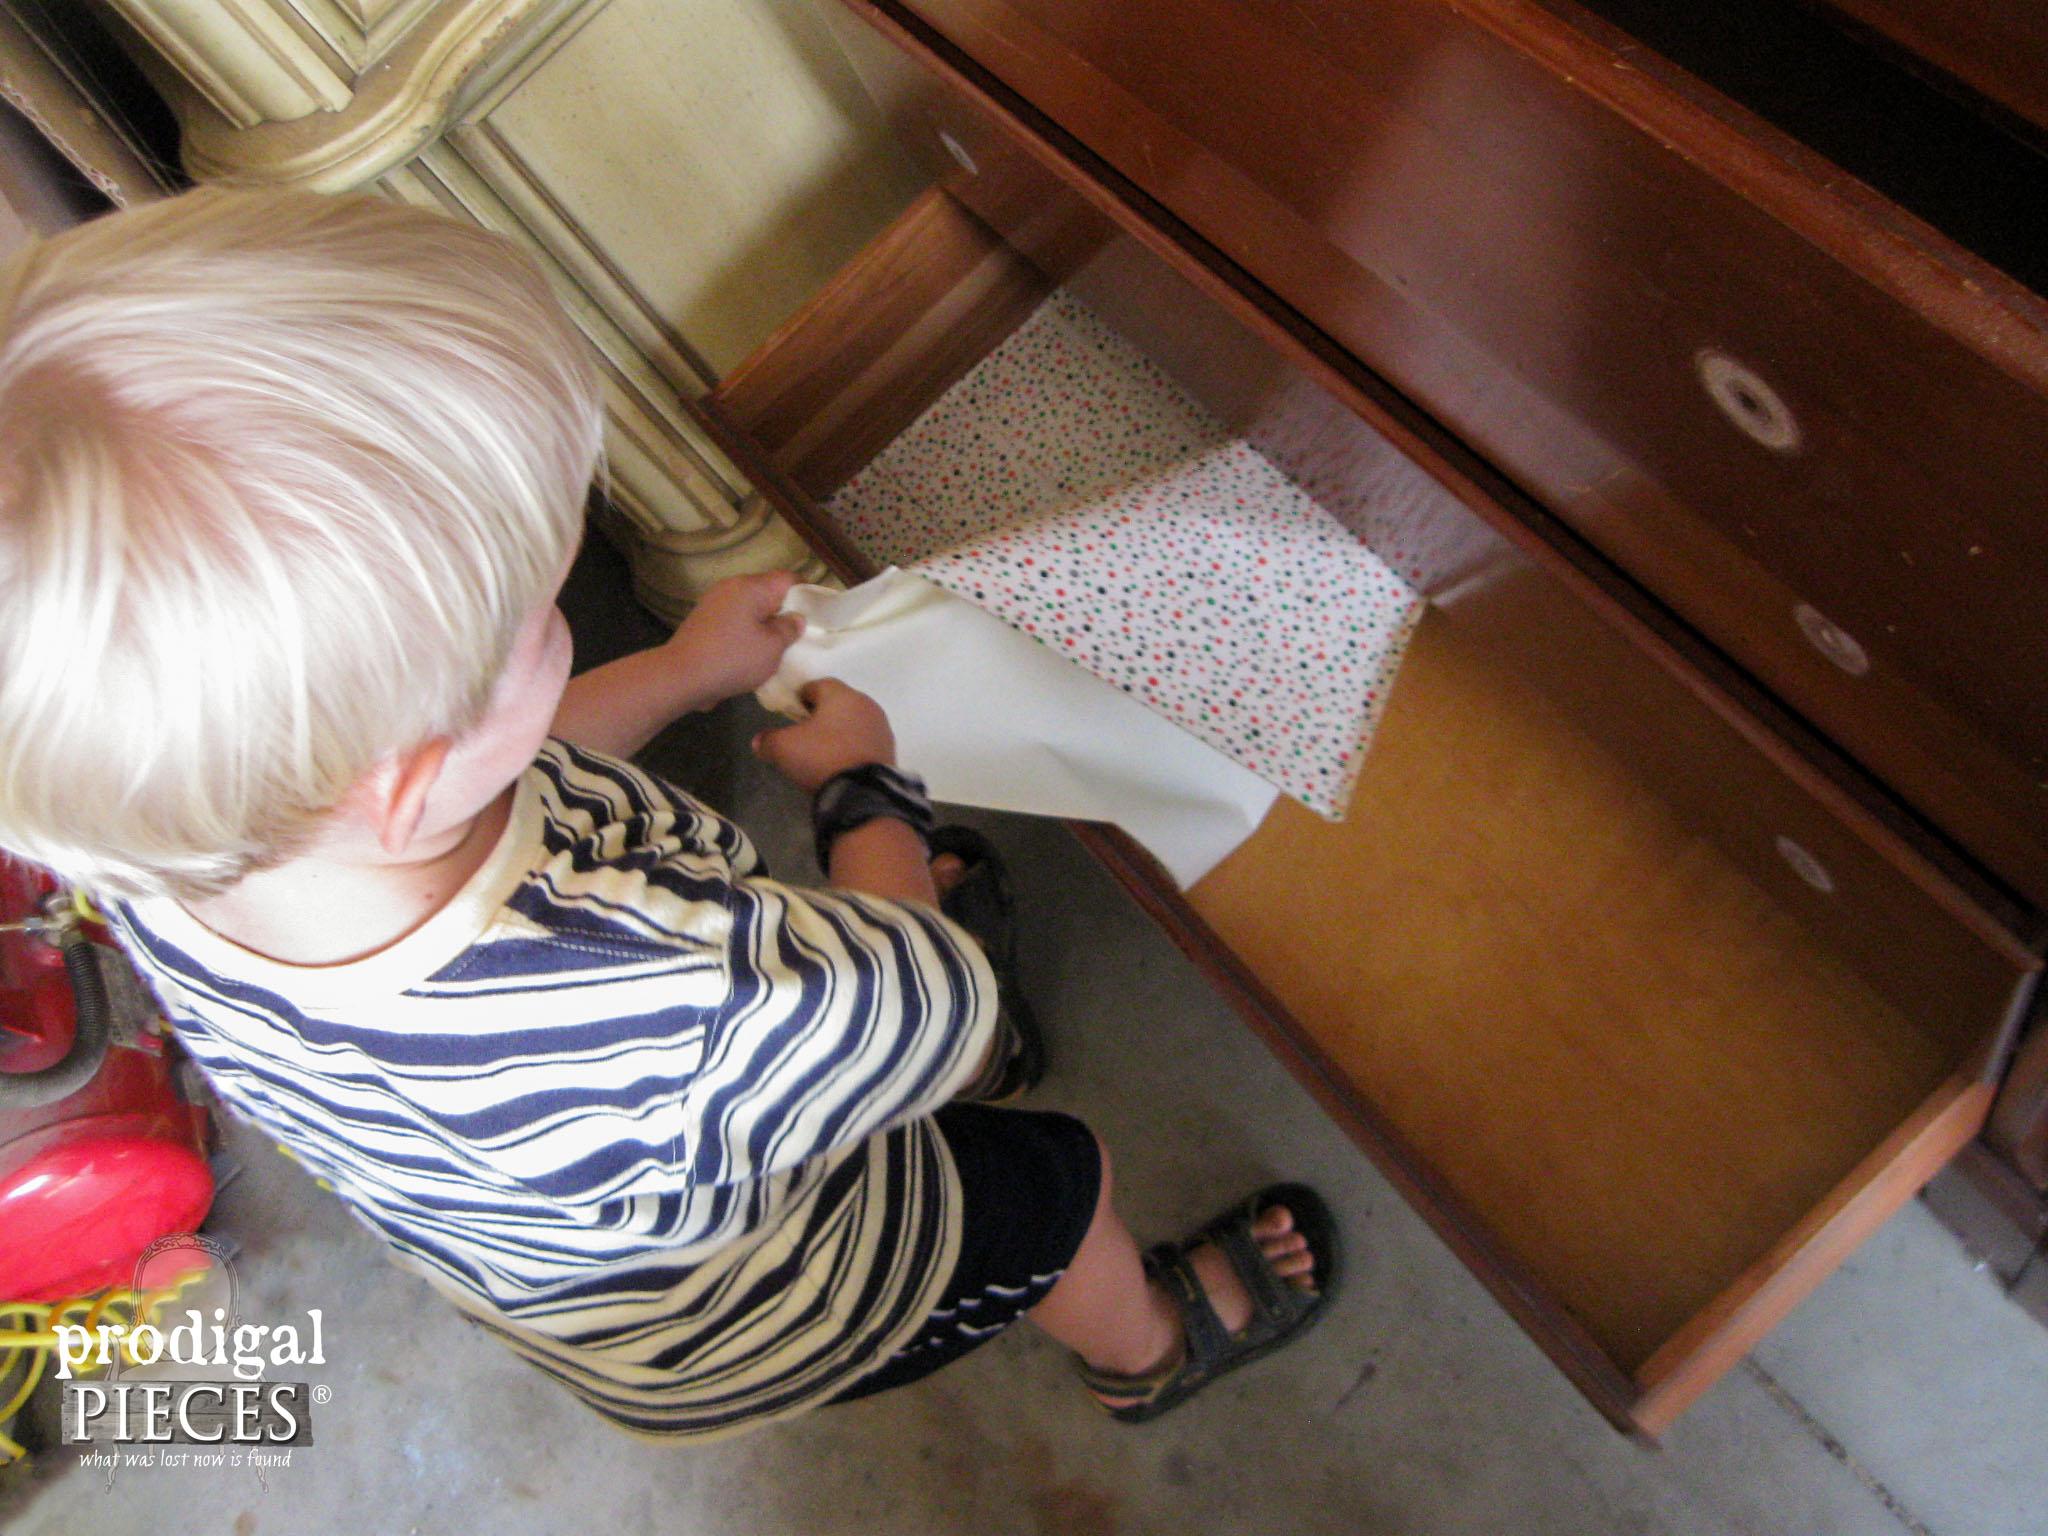 Little Boy Helper with Bedroom Set | Prodigal Pieces | www.prodigalpieces.com